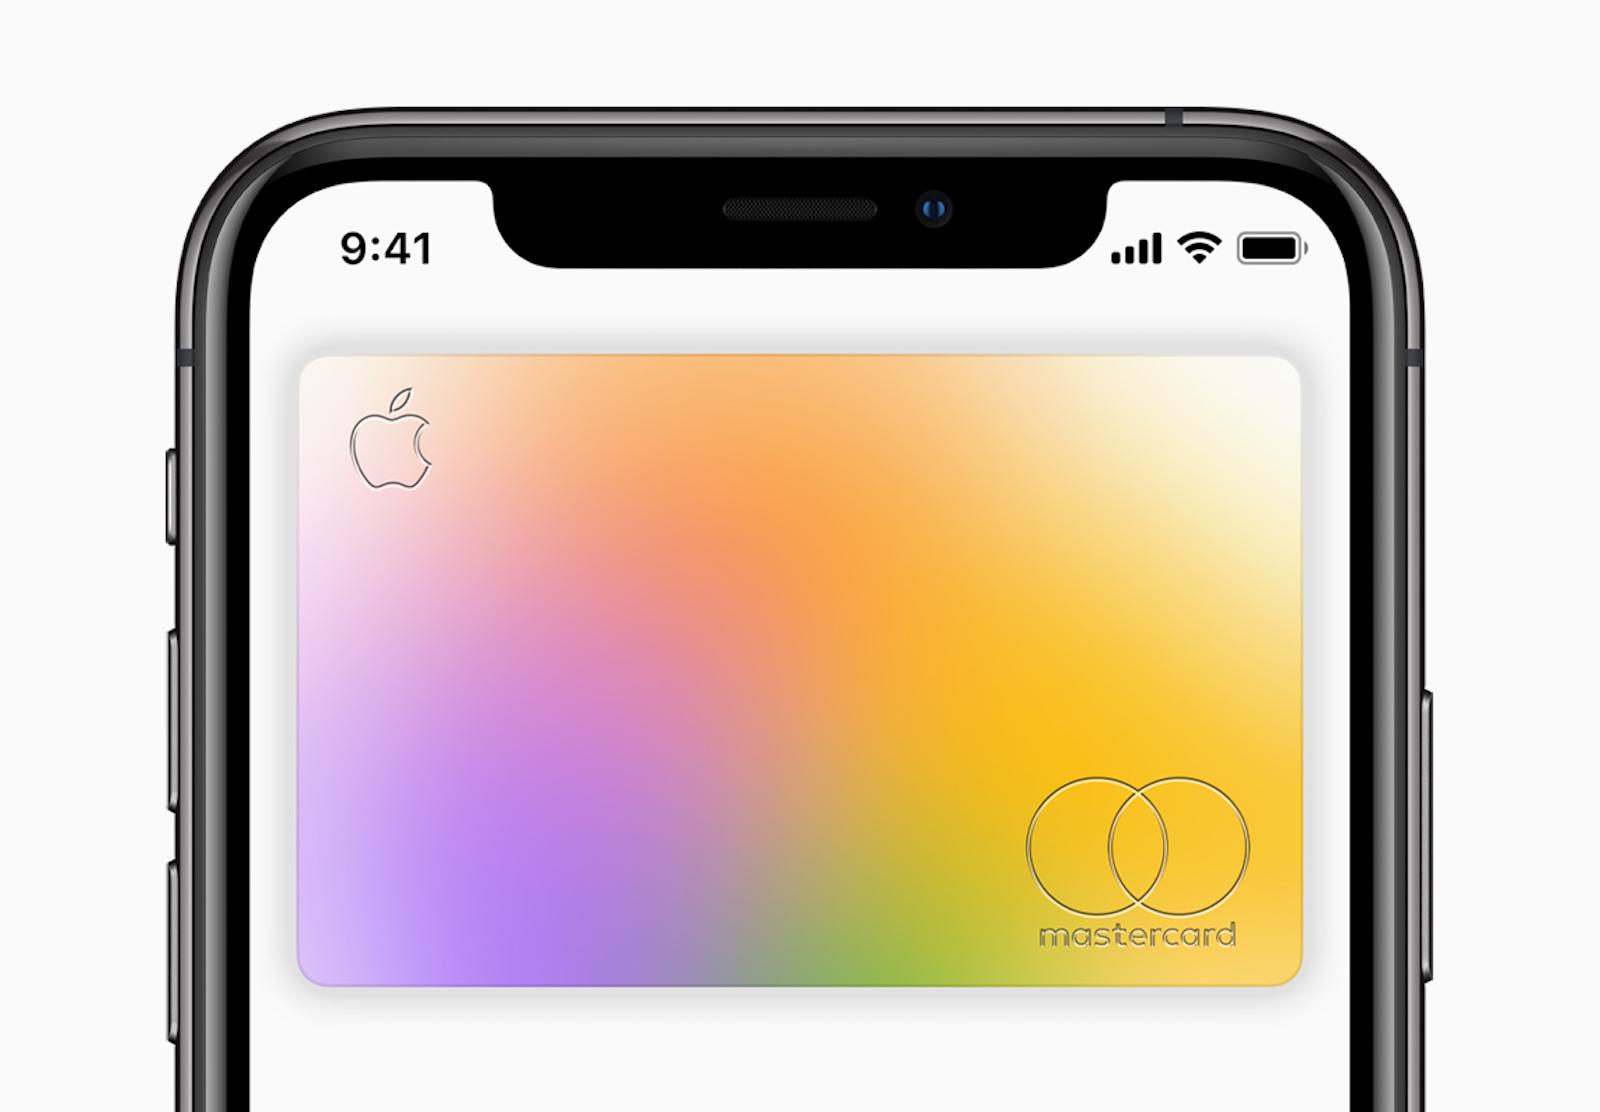 Apple-Card-available-today-card-on-iPhoneXs-screen-082019.jpg